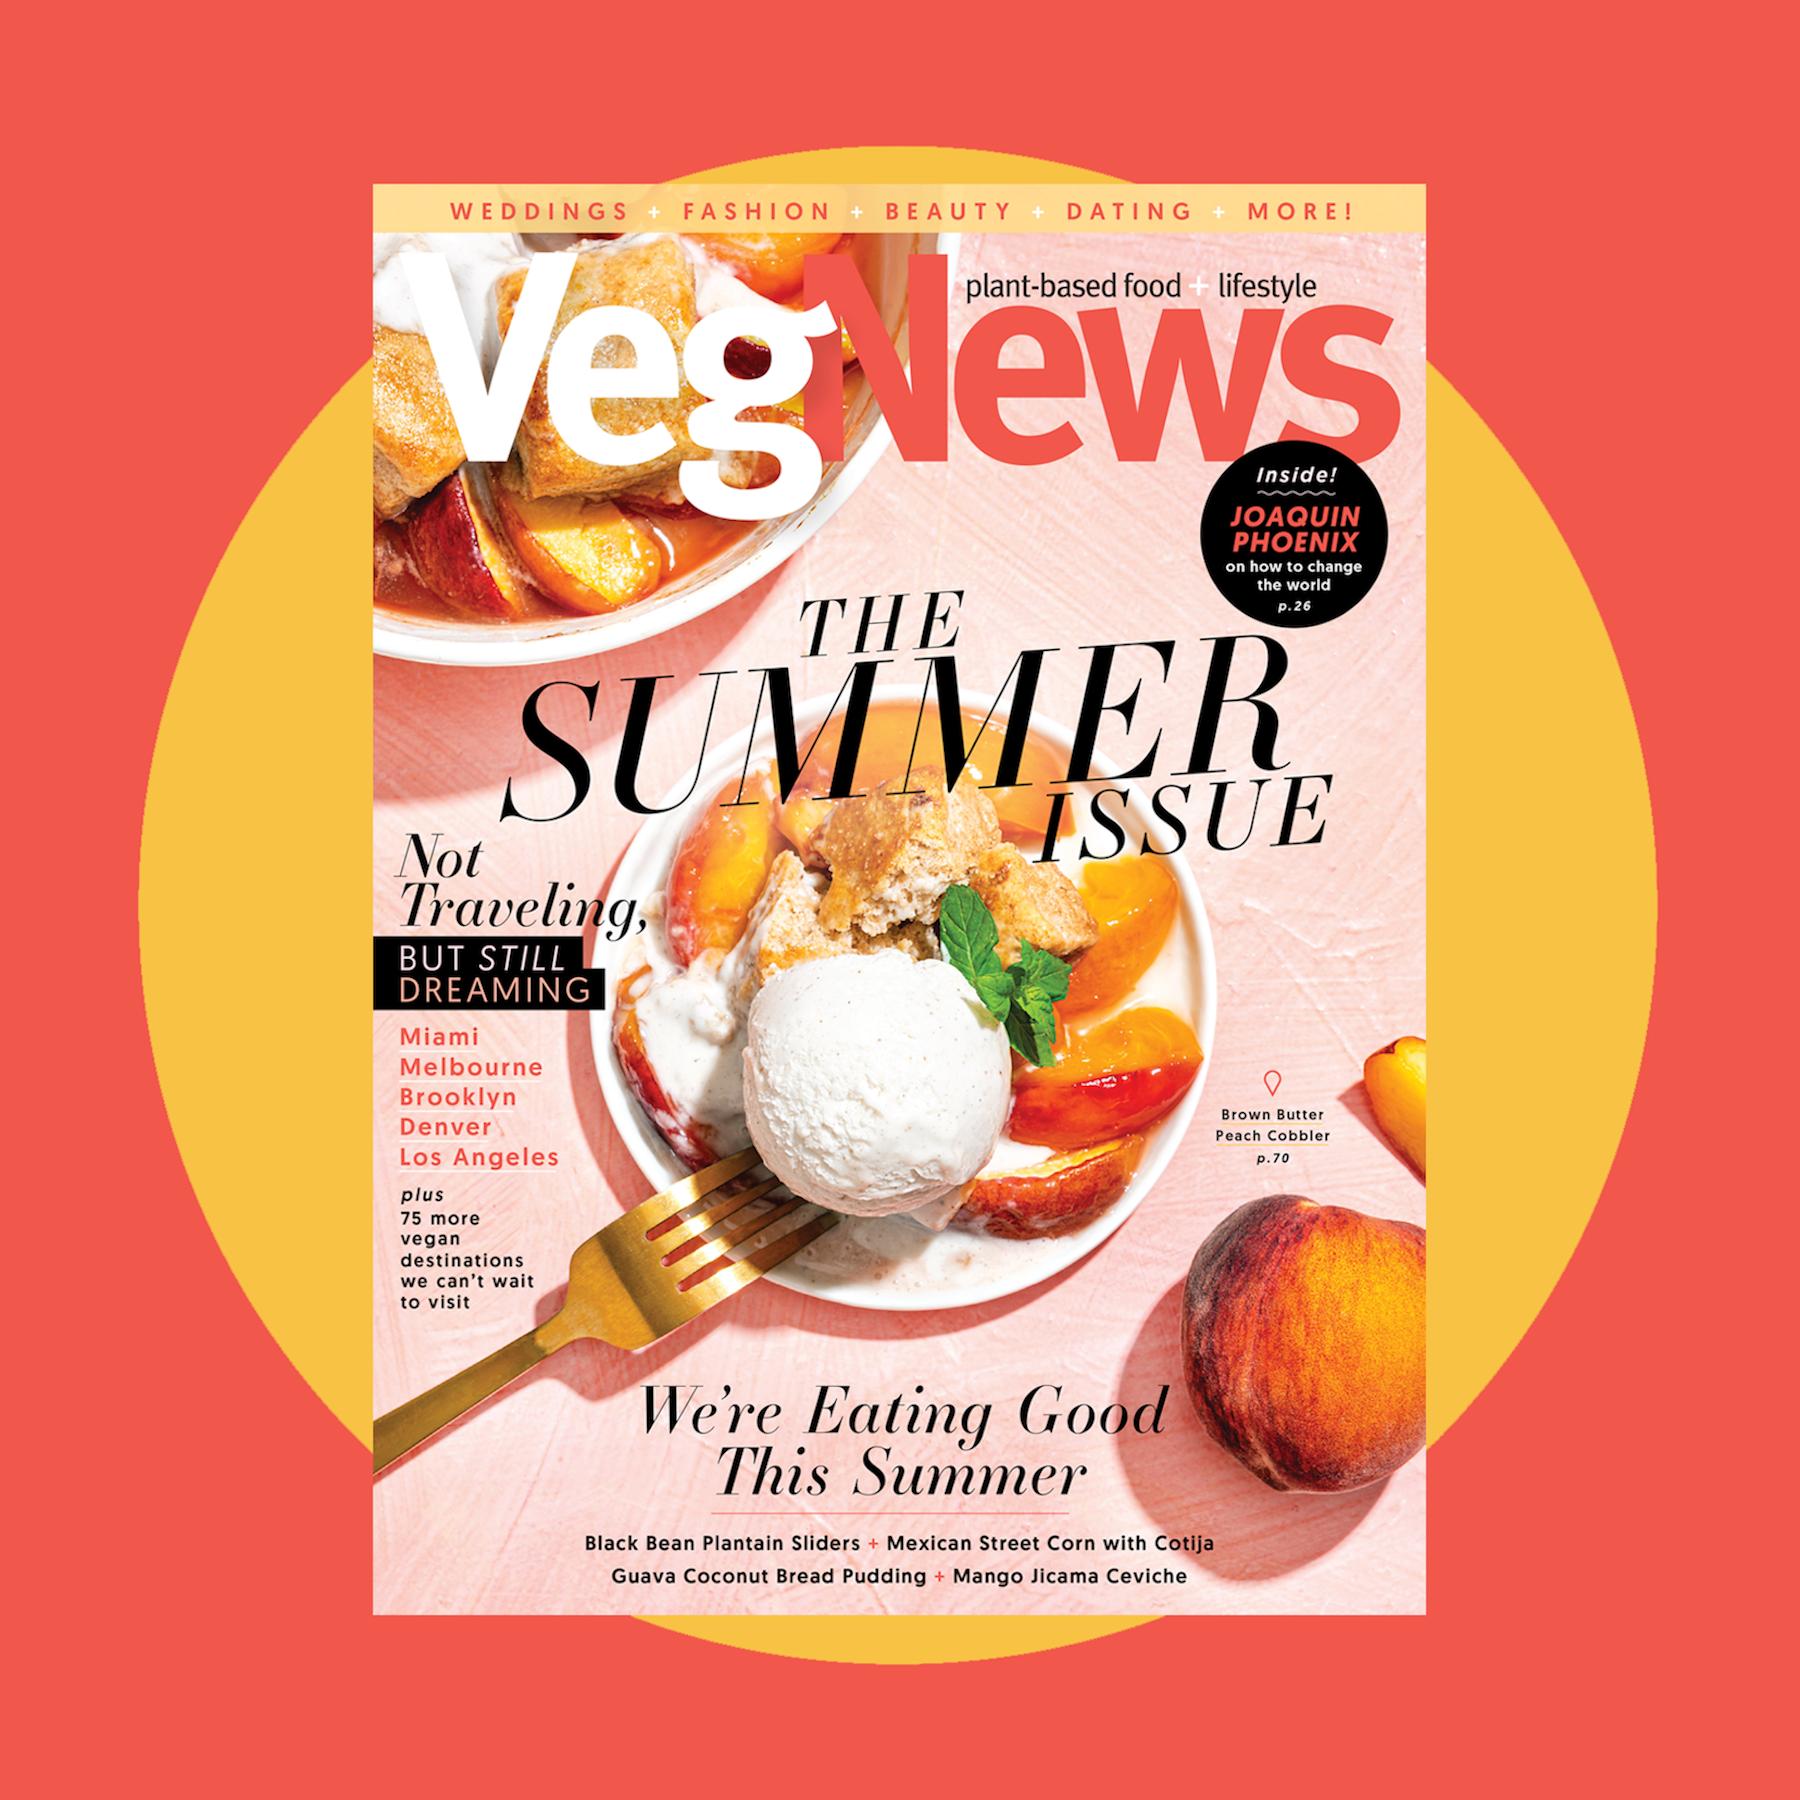 The 2020 Summer Issue 123 In 2020 Tropical Food Vegan Restaurants Vegan Chef